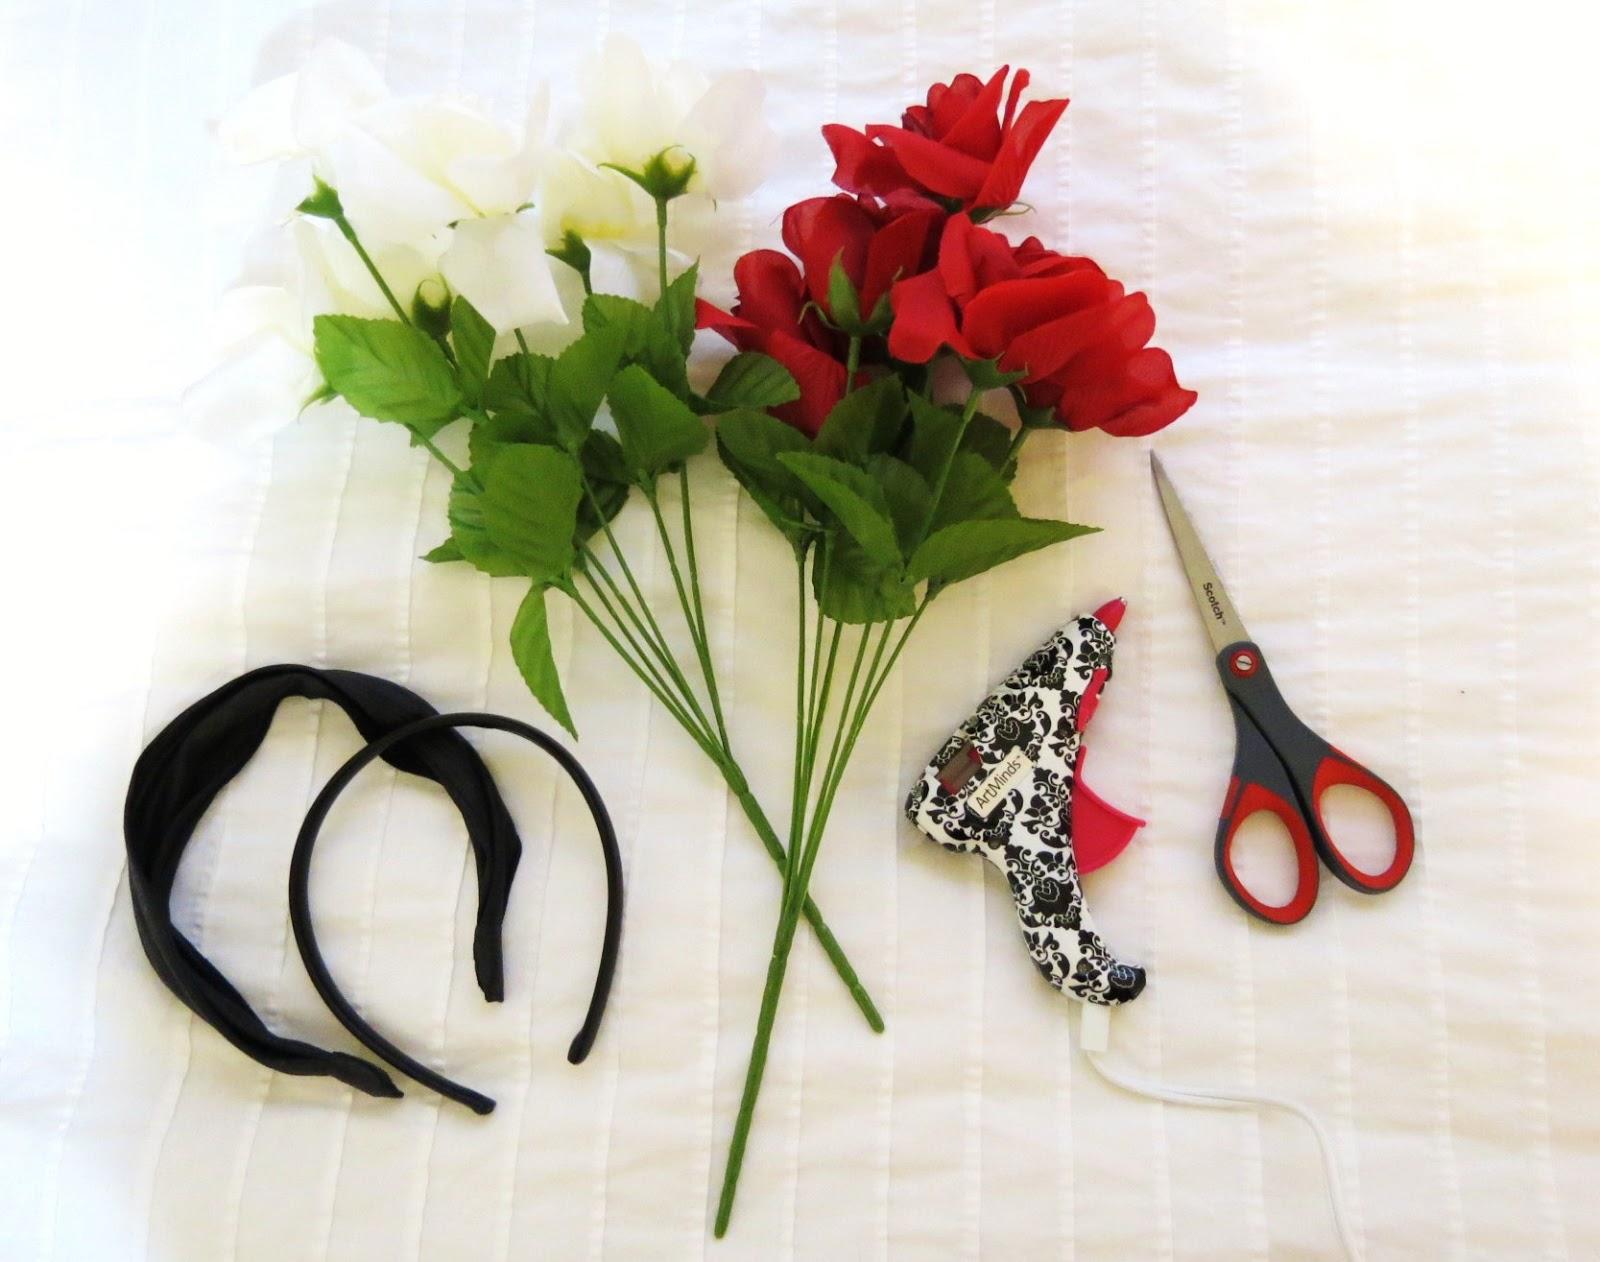 Kitchen garden diy flower crown materials fake flowers i got mine from the dollar store simple headband i used ones i already had laying around hot glue gun scissors izmirmasajfo